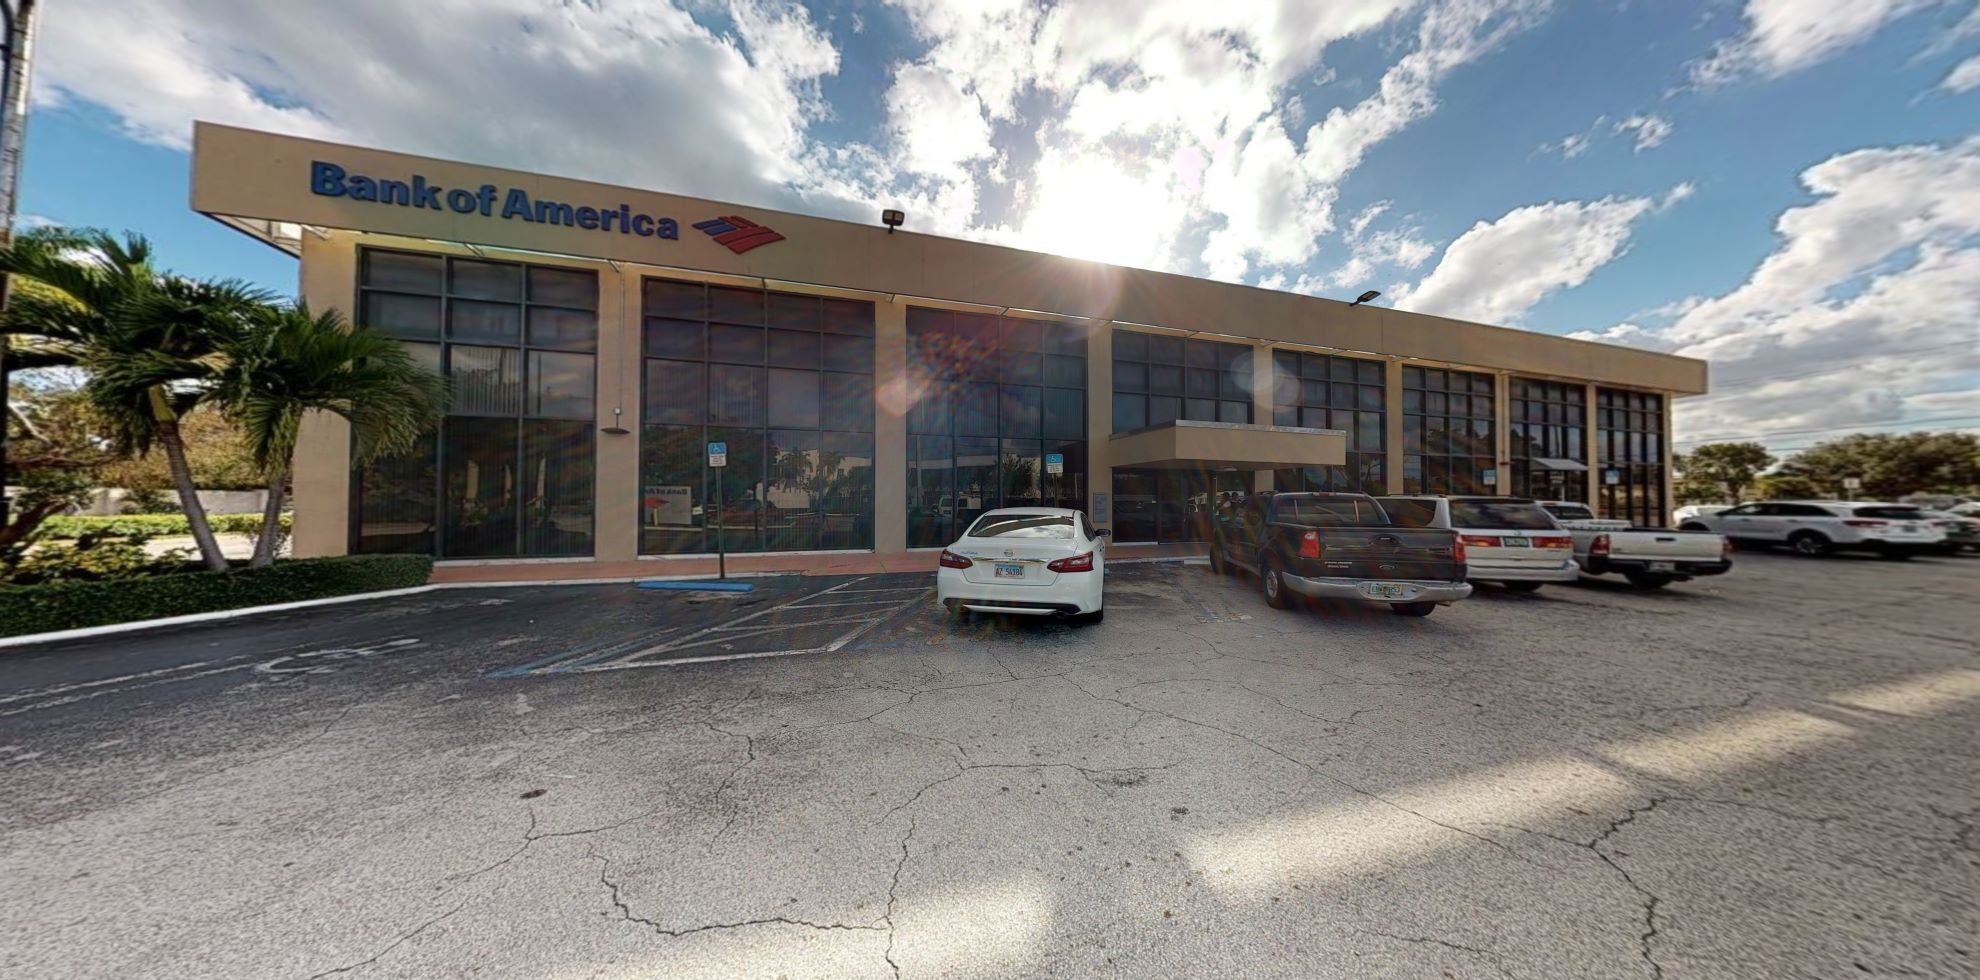 Bank of America financial center with drive-thru ATM   5000 Biscayne Blvd, Miami, FL 33137